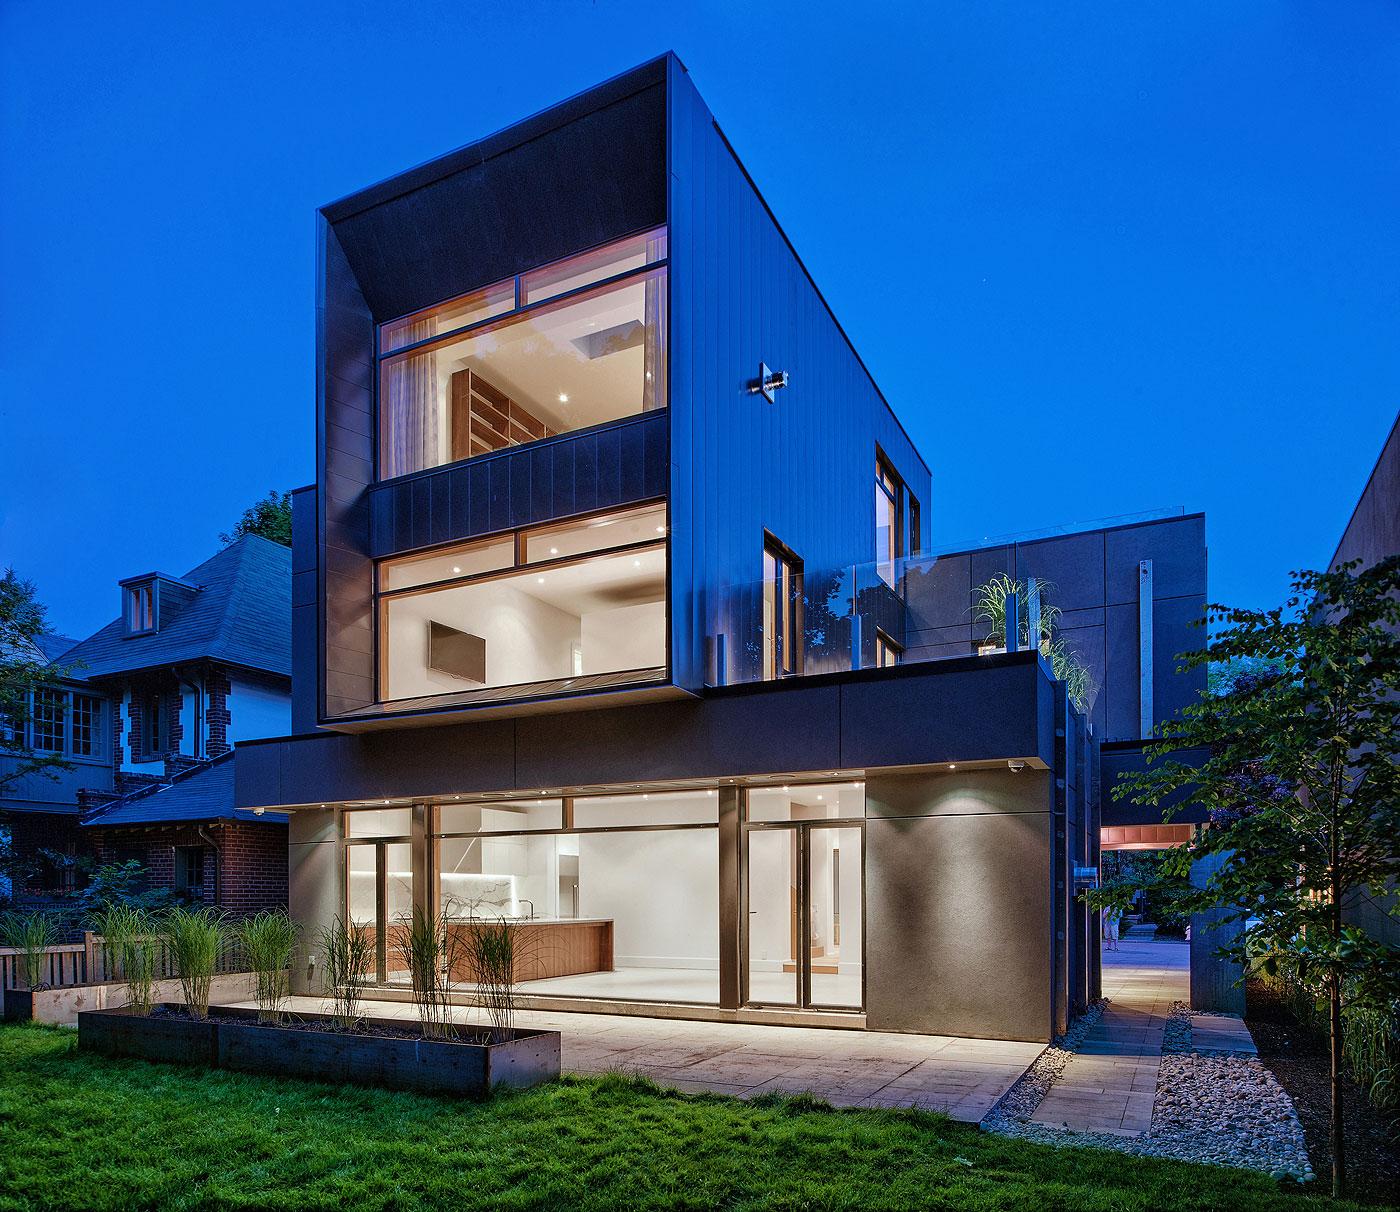 residencia-heathdale-tact-architecture-design (13)